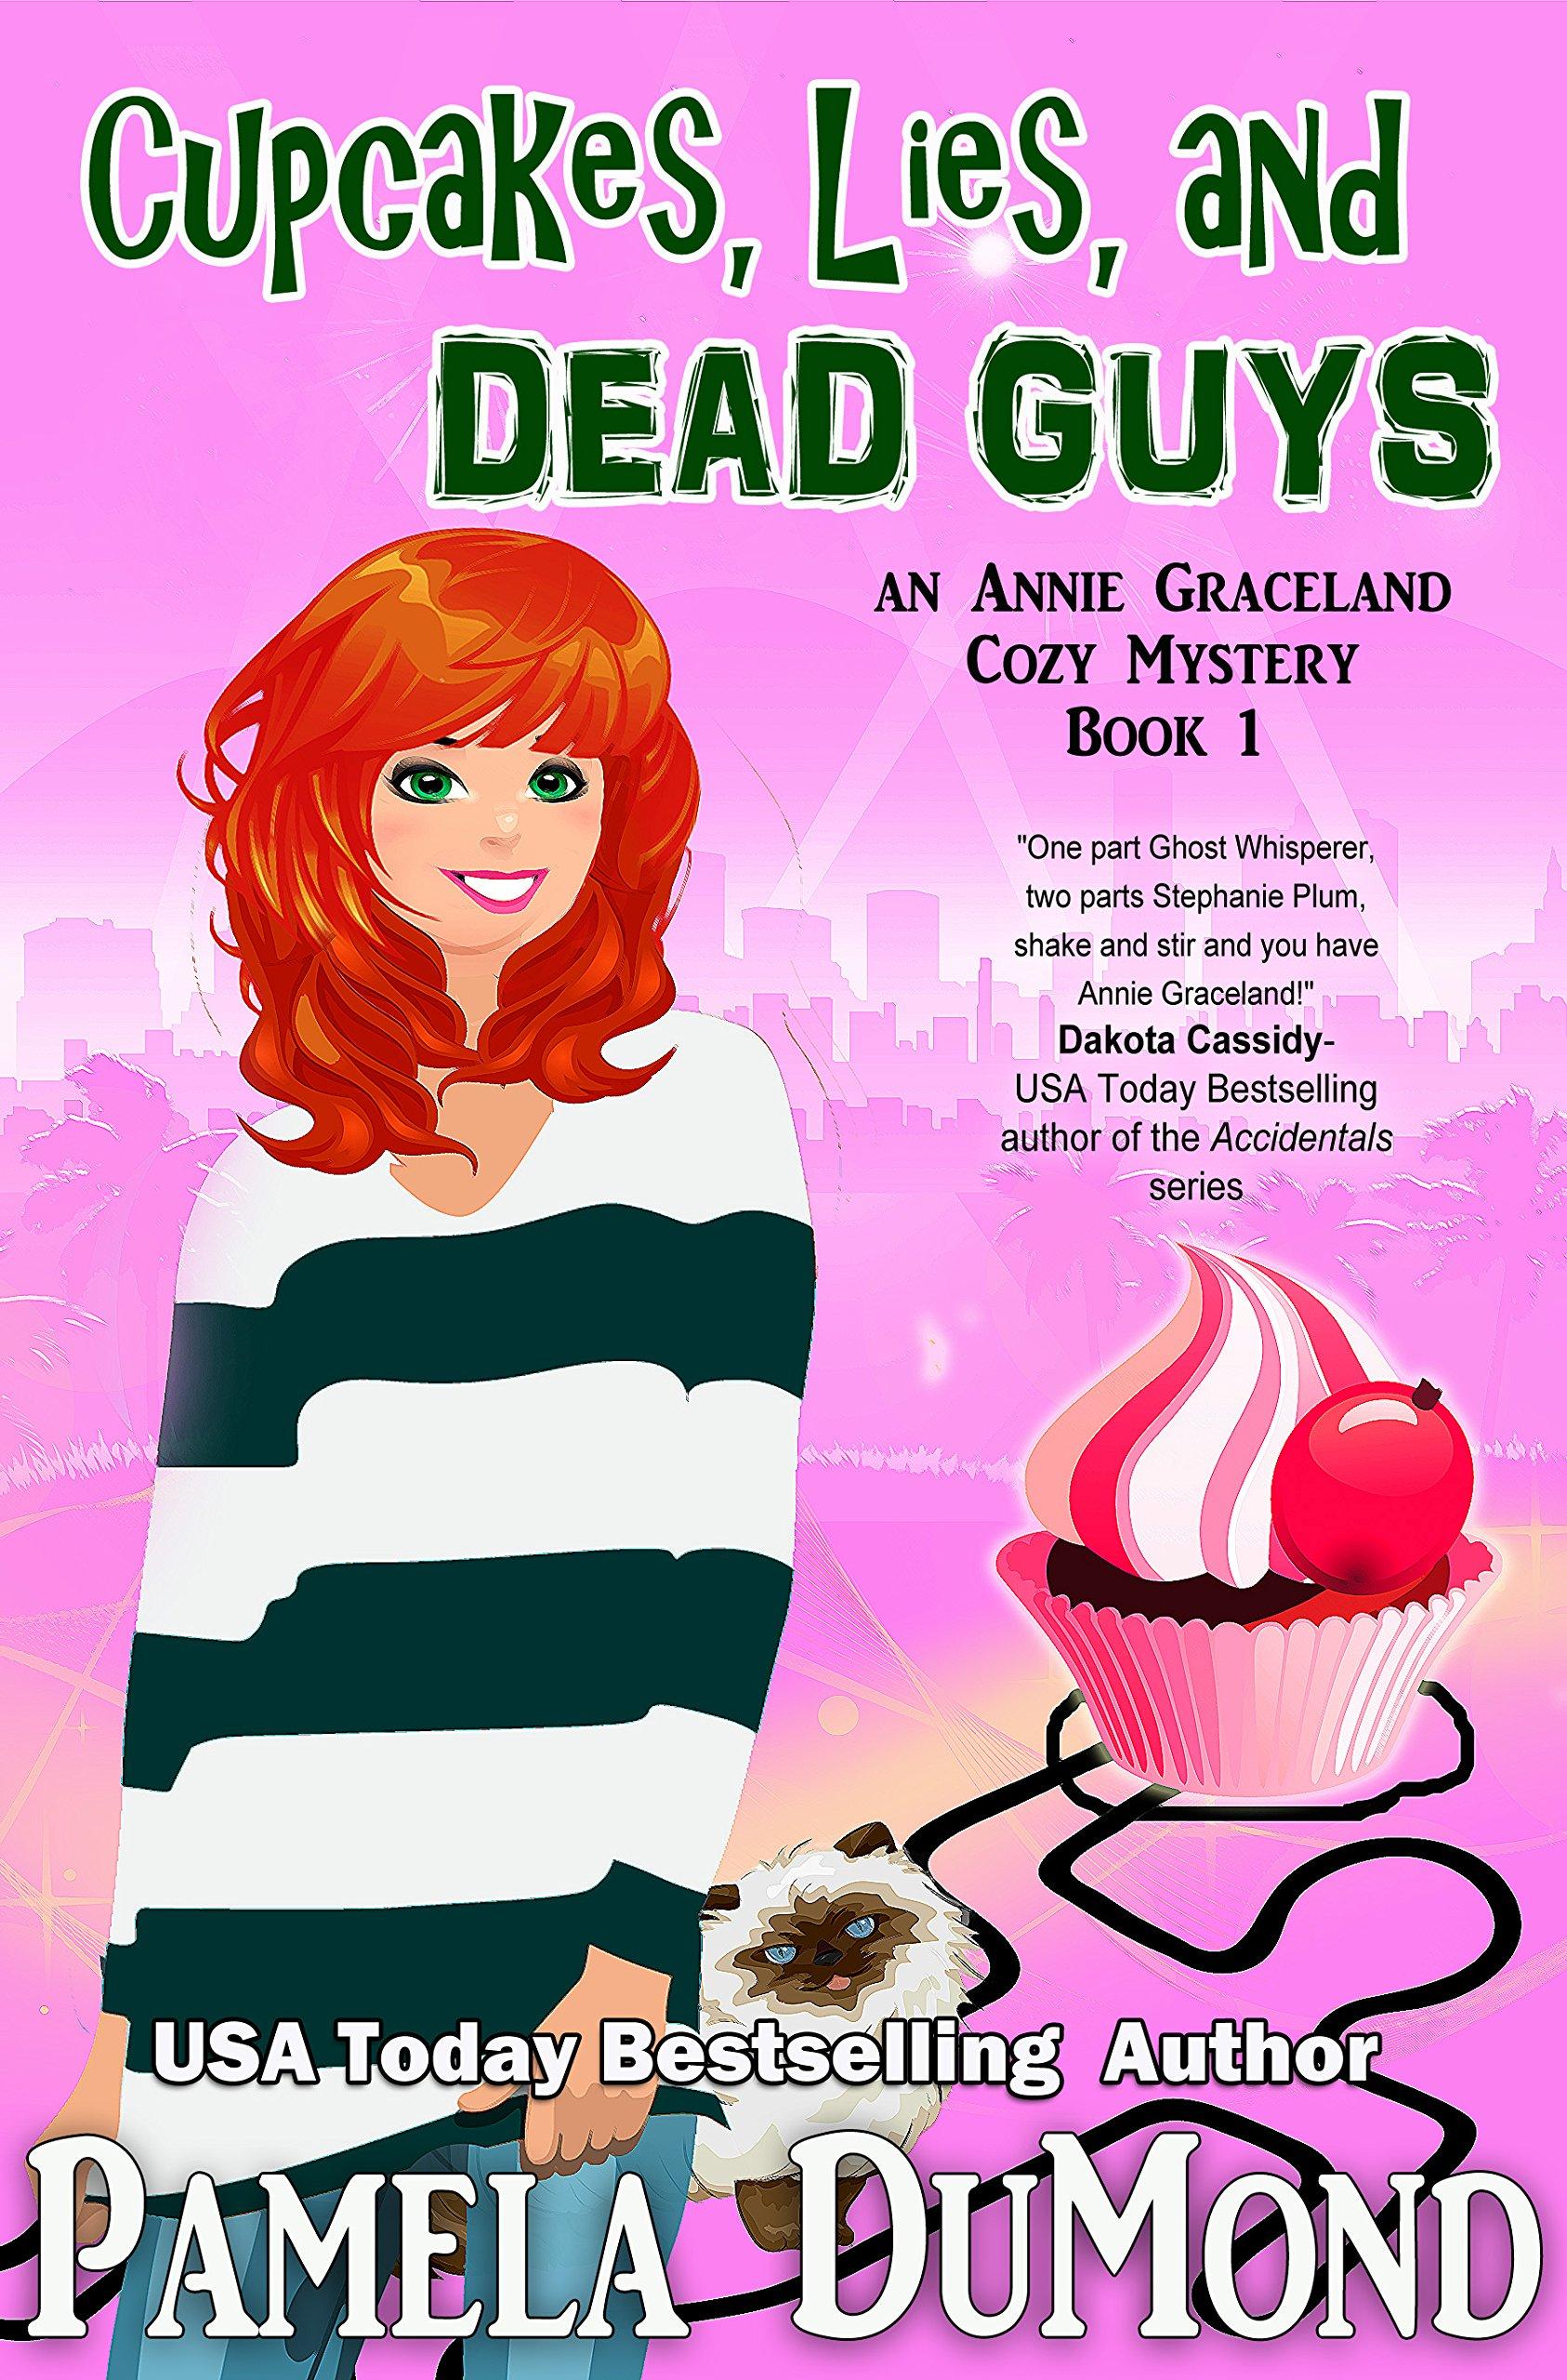 Cupcakes Lies Dead Guys Graceland product image